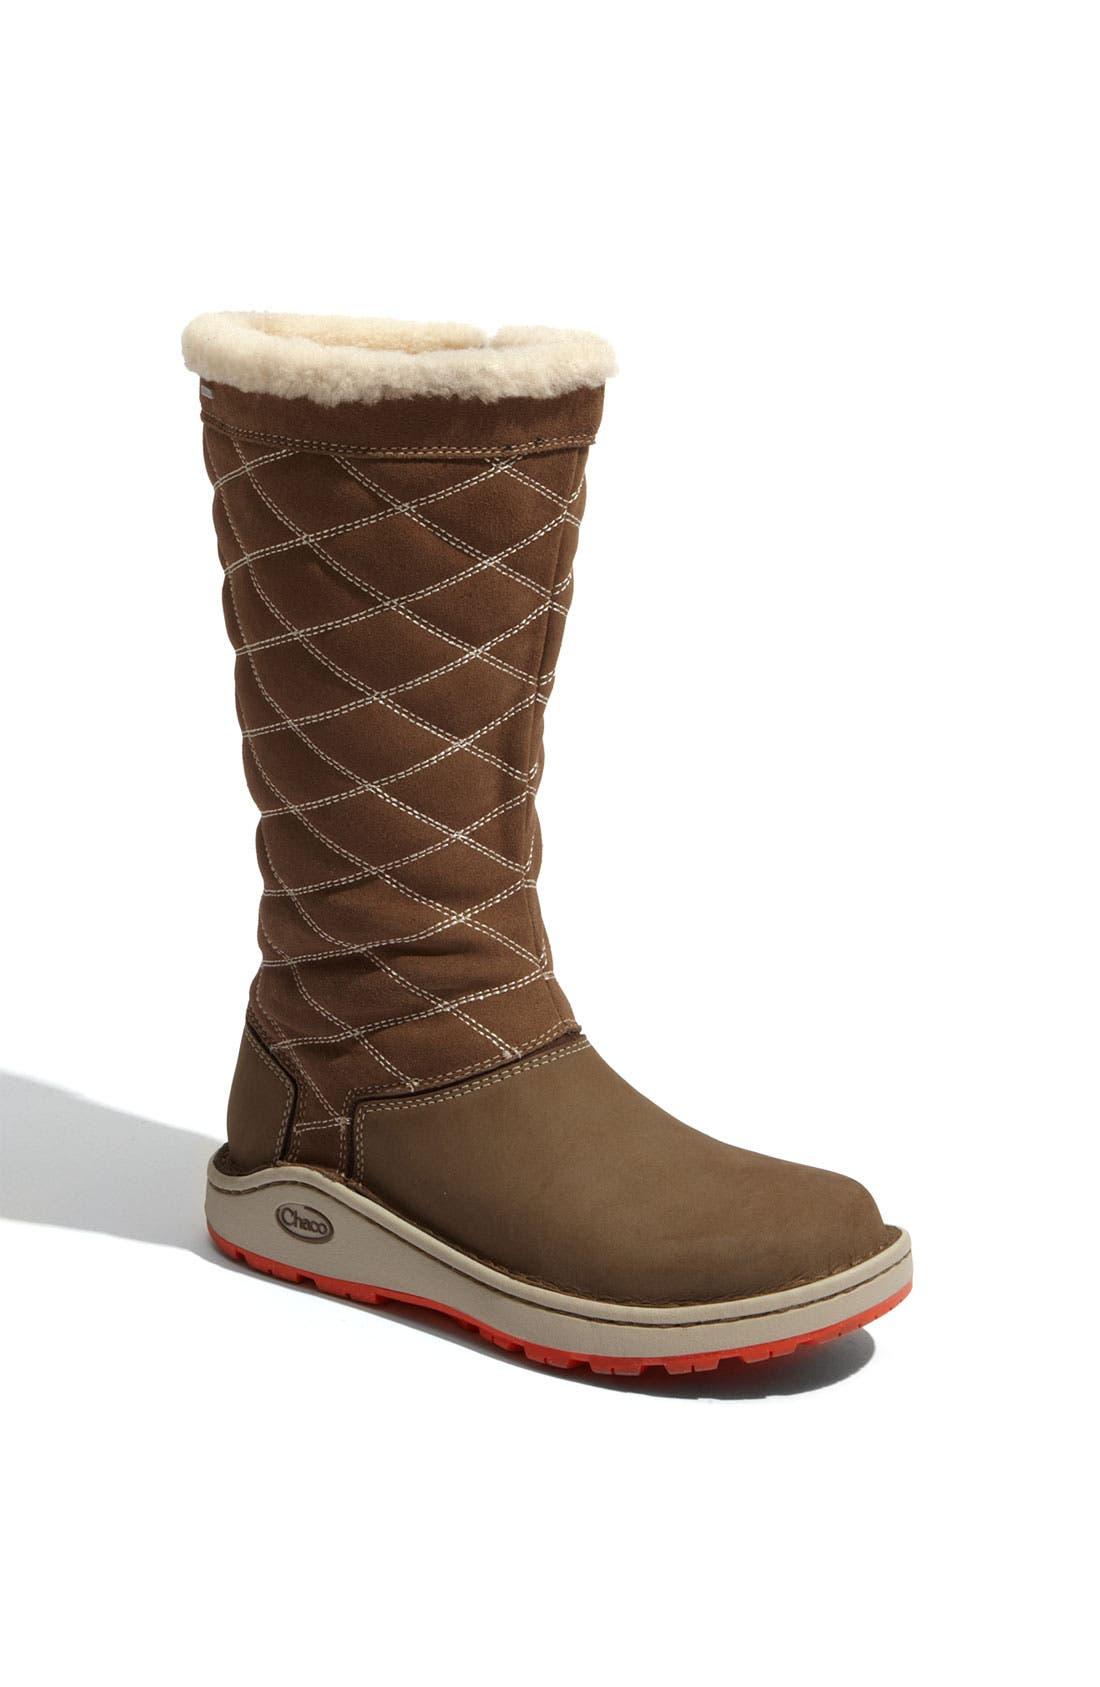 Main Image - Chaco 'Arbora' Boot